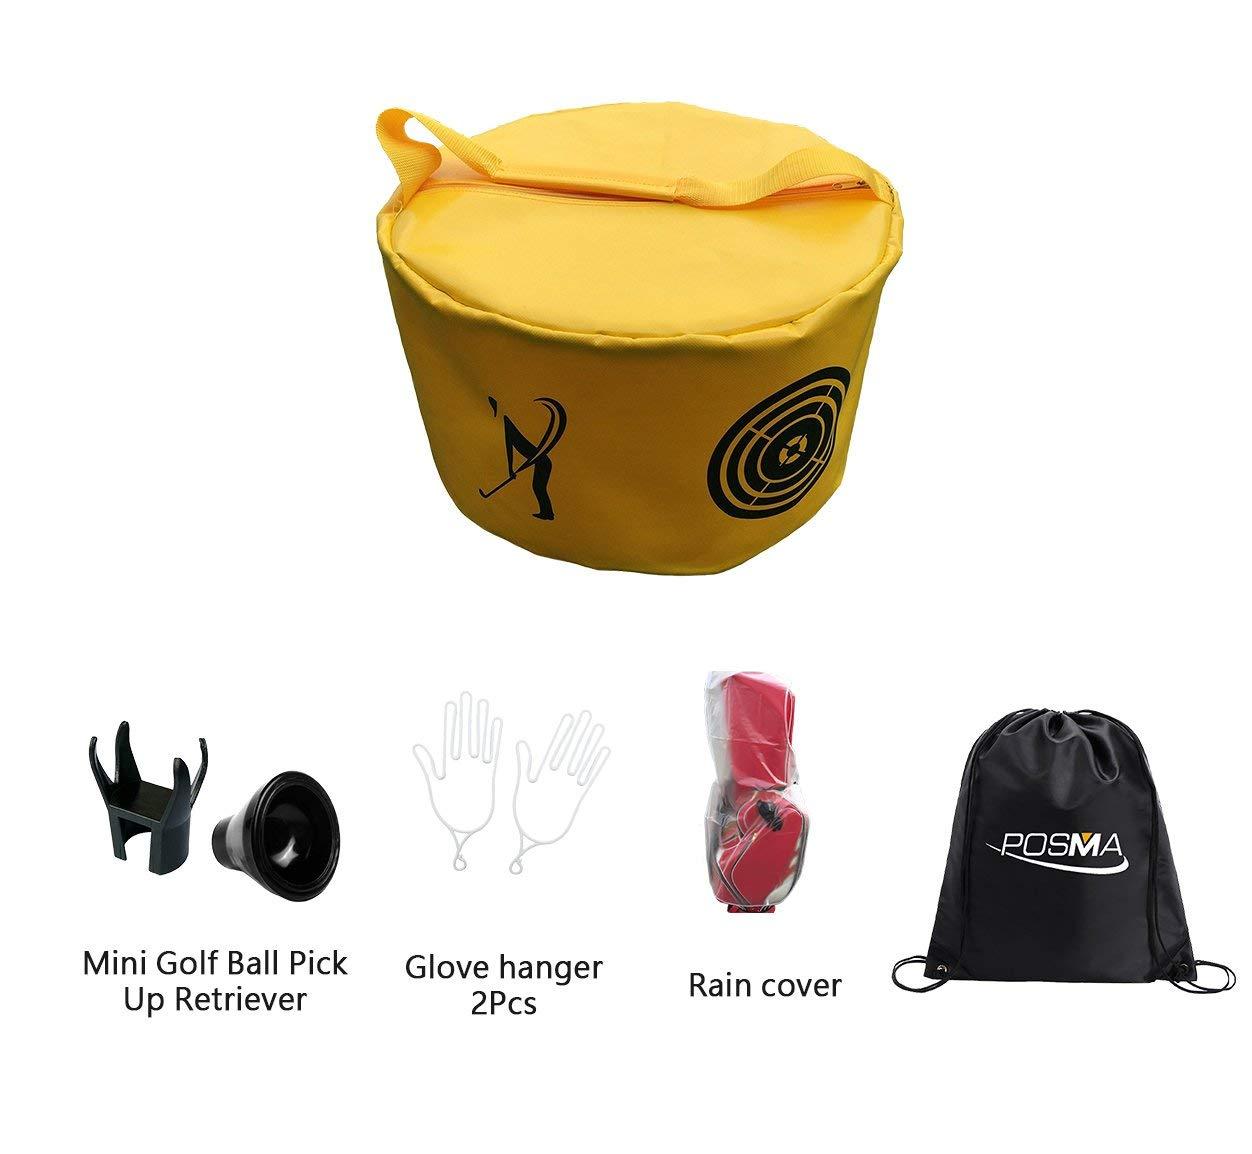 POSMA HB010I Golf Hitting Bag Swing Impact Power Smash Bag Training Set with 1pc Rain cover + 2pcs Glove hanger + 2pcs mini Golf Ball Pick Up Retriever + Cinch Sack Carry Bag